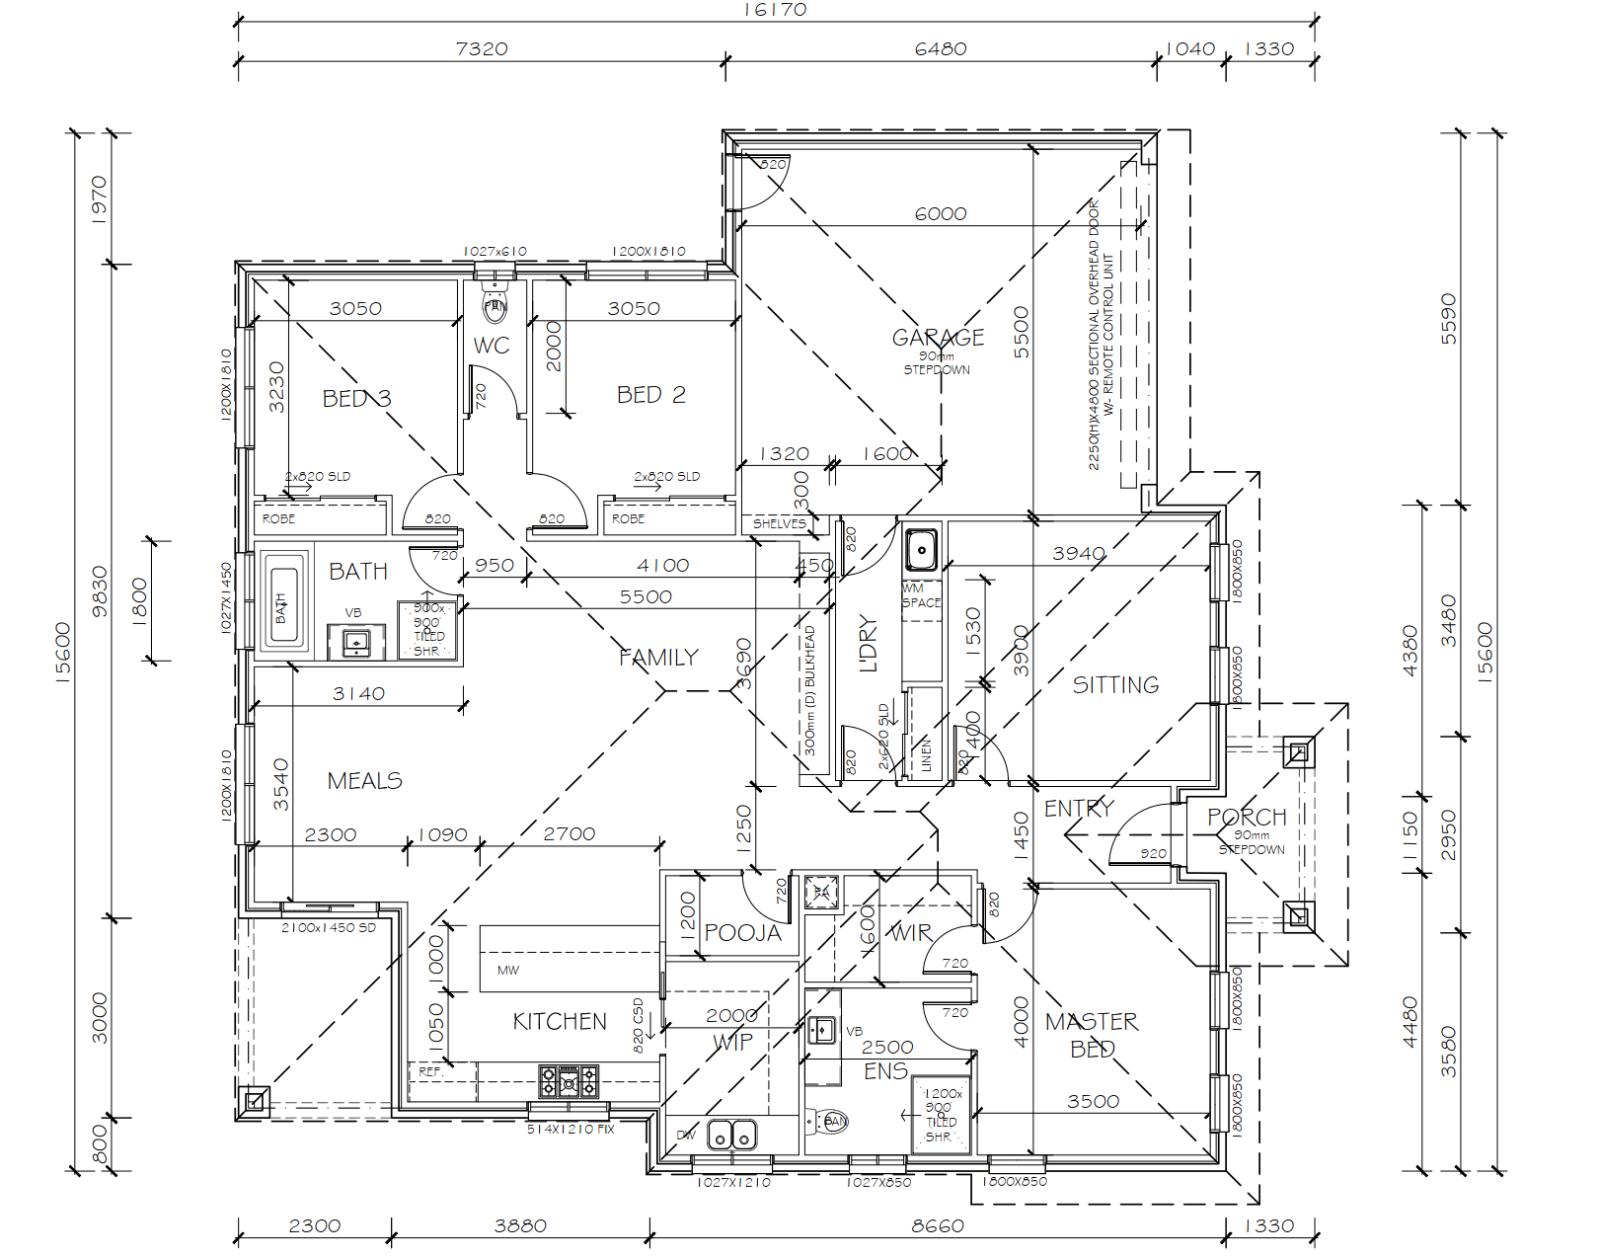 View Topic Floorplan Dilemma On Corner Square Block Home Renovation Building Forum